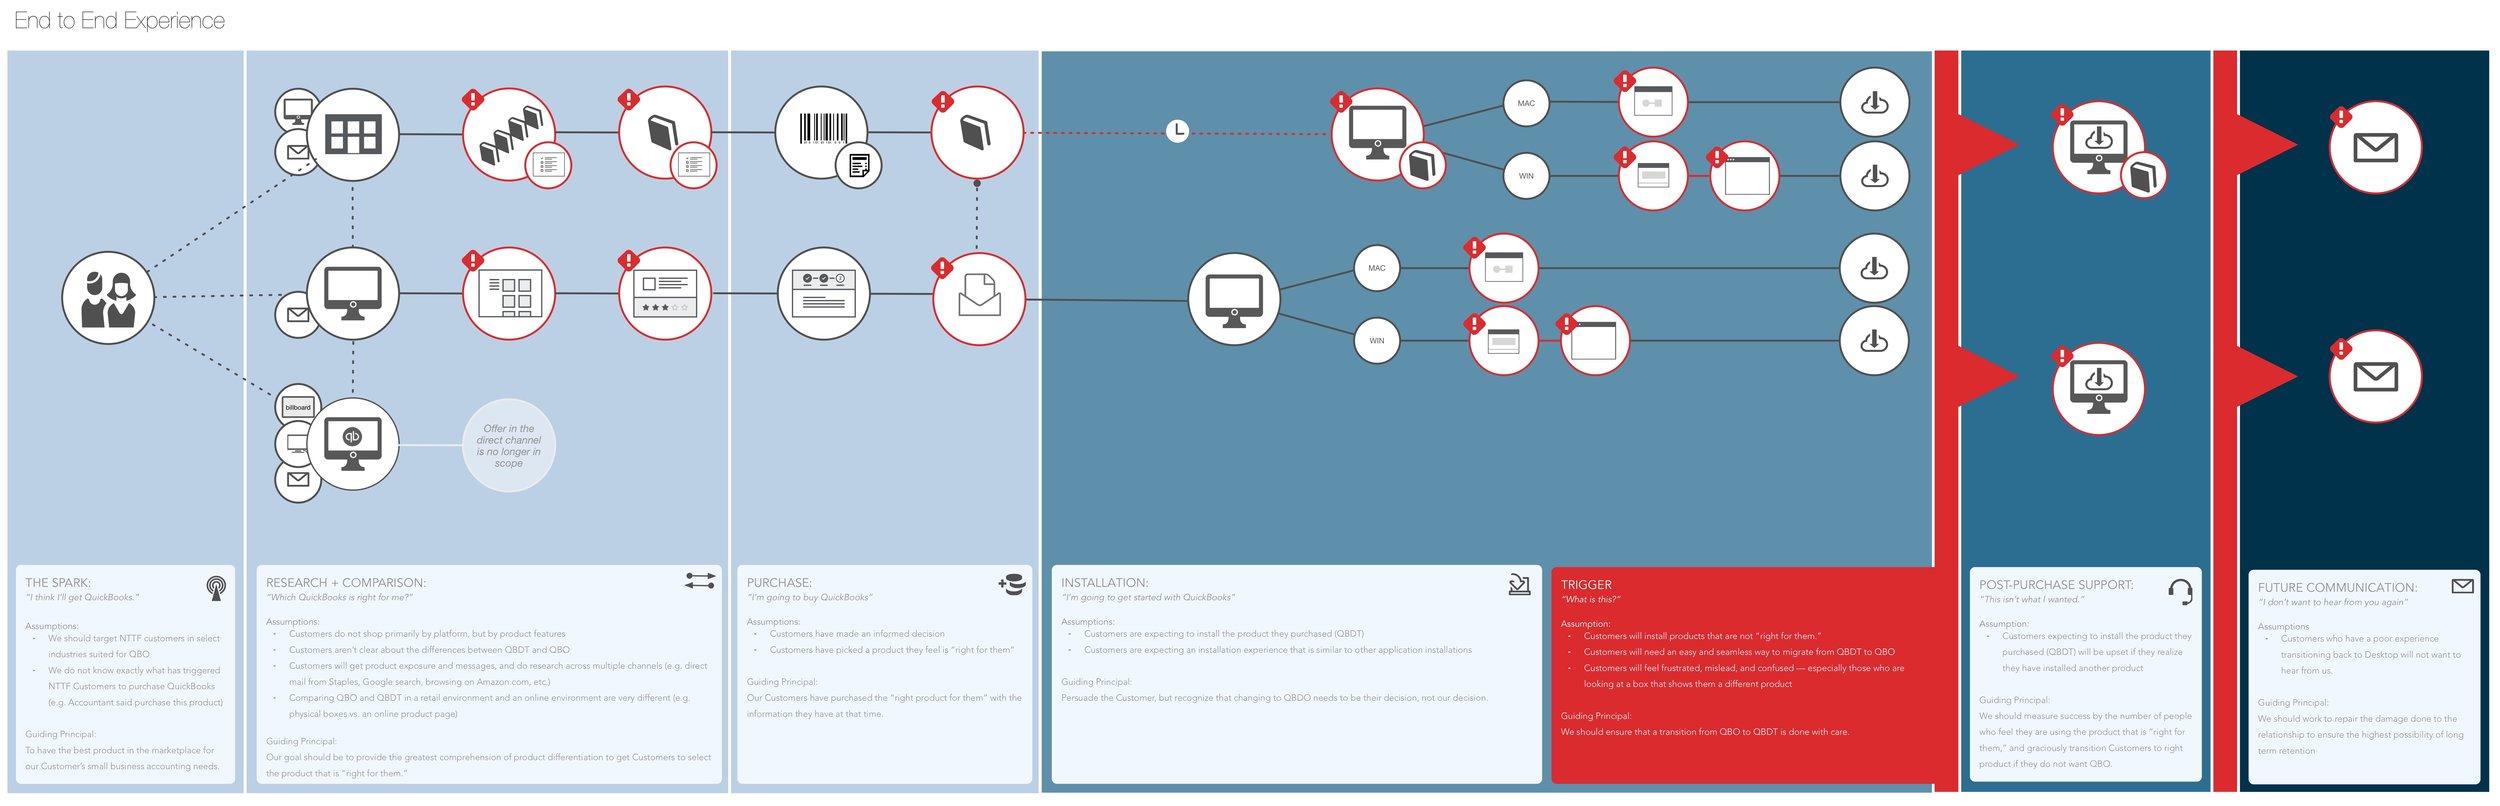 Bundle Touchpoint Map.jpeg